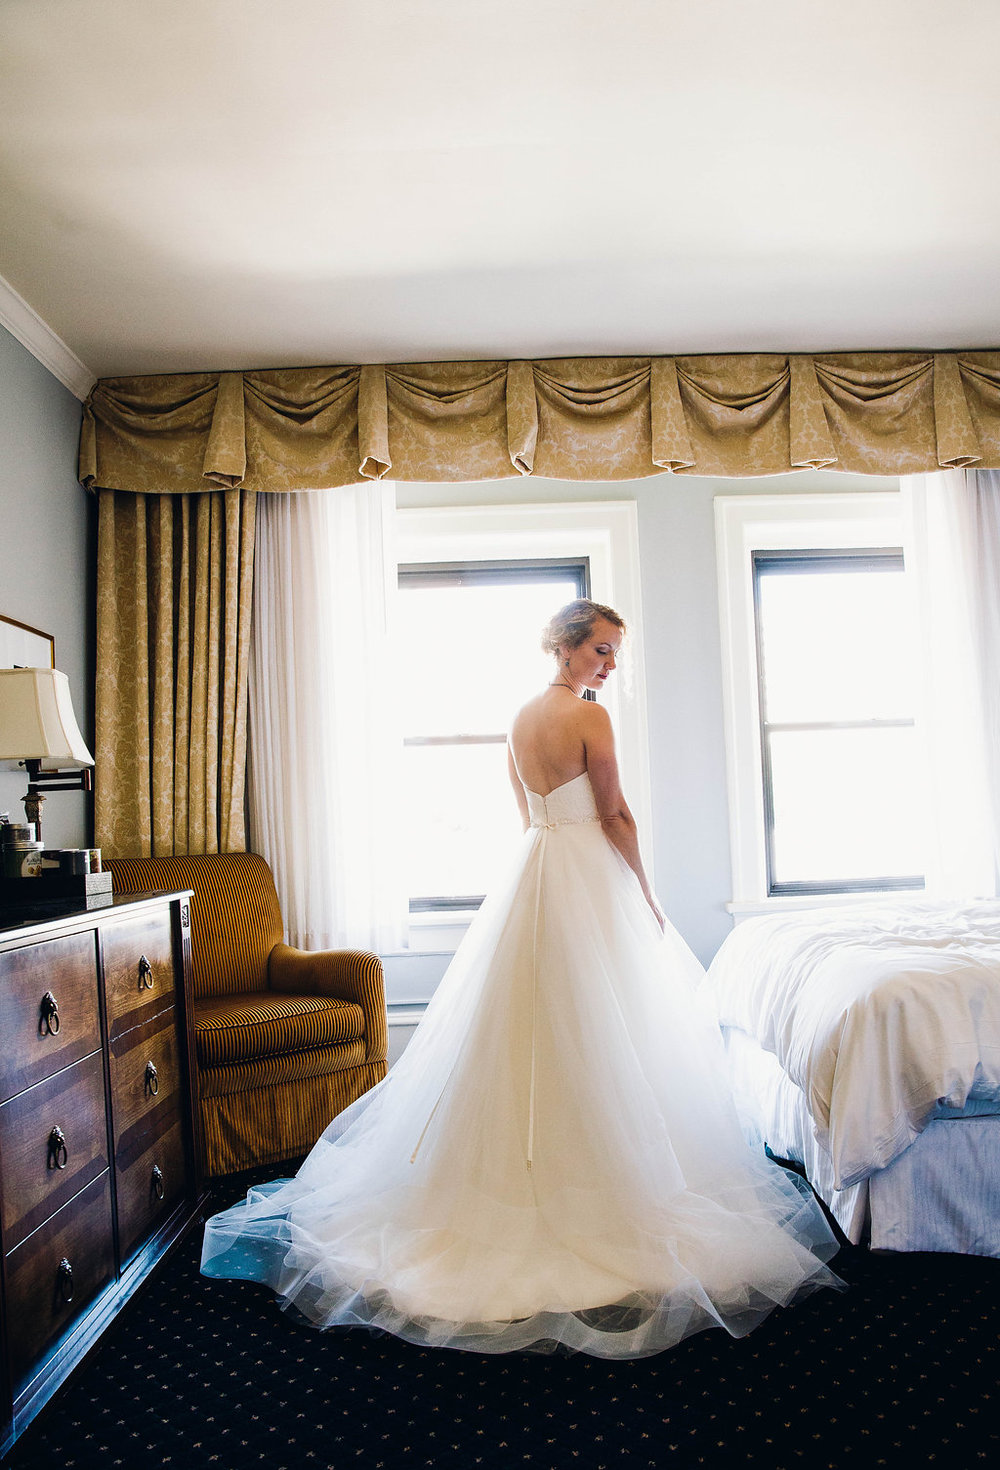 Nissa+Jesse_Wedding_Seattle_SoleRepairShop_6252015_49.jpg